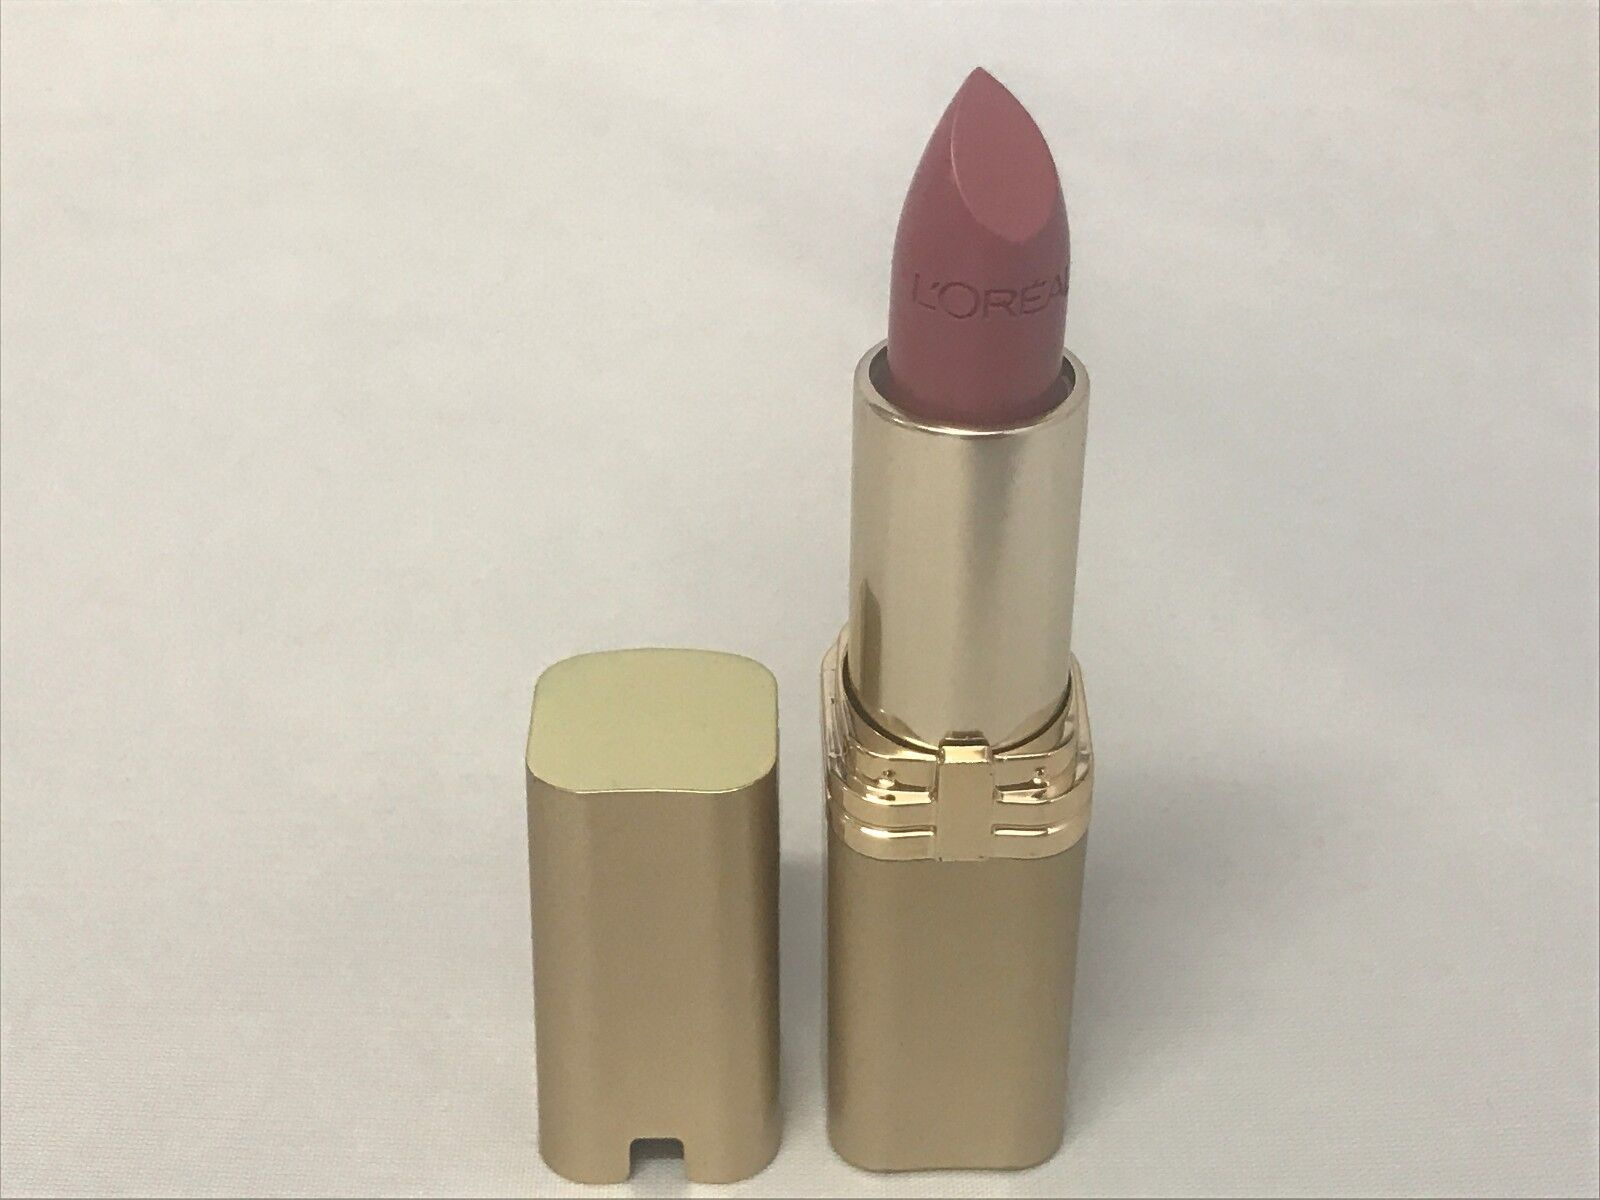 1 Tube Loreal Colour Riche Lipstick 560 Saucy Mauve Unsealed